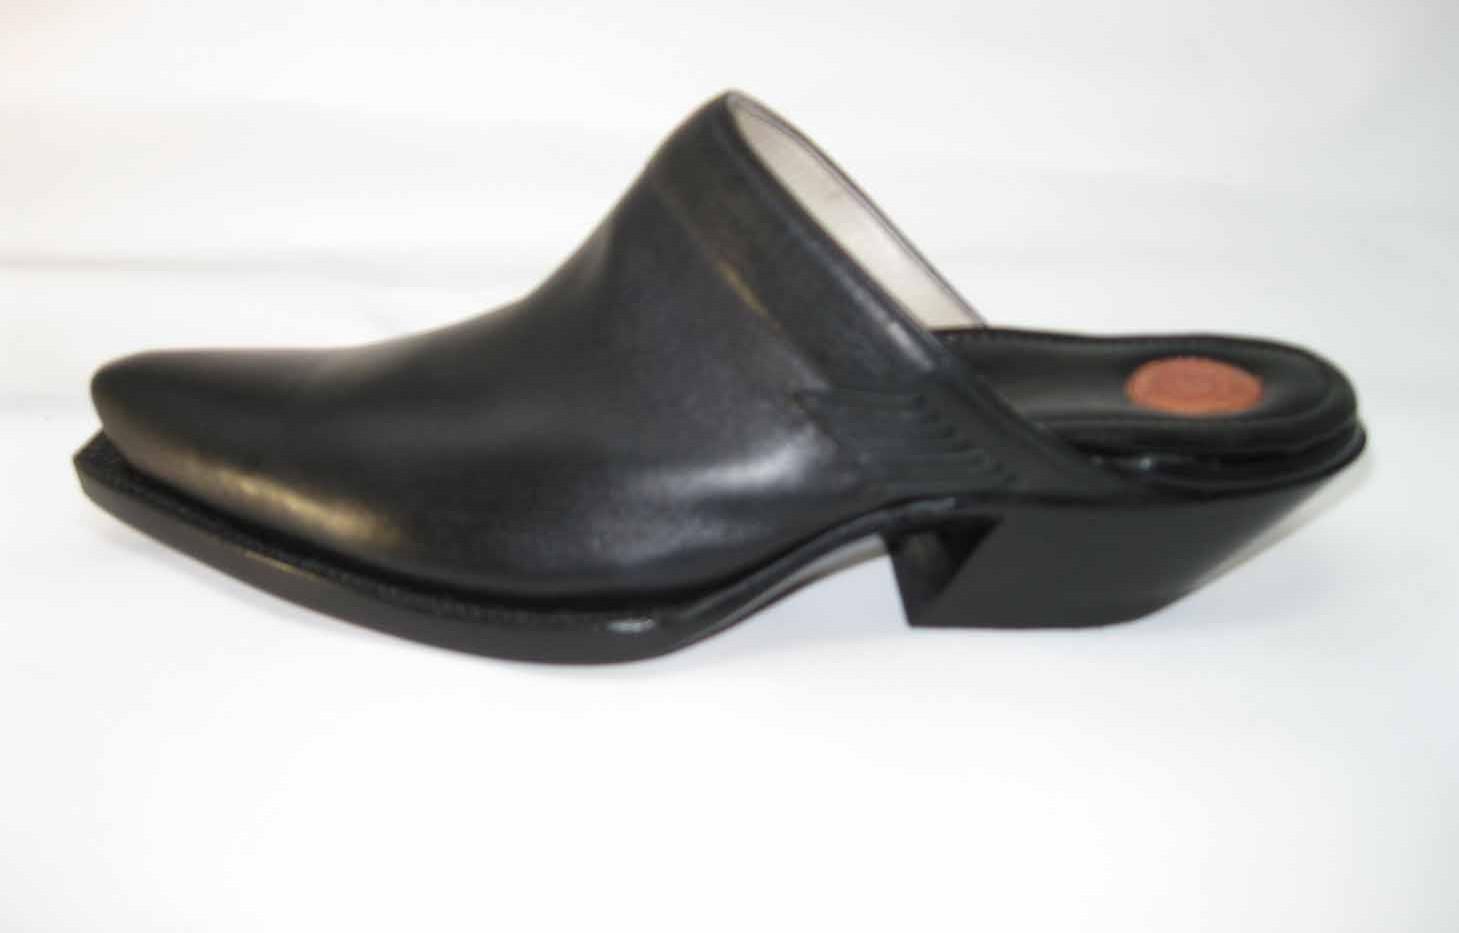 Western Mule. Love the toes and heels.